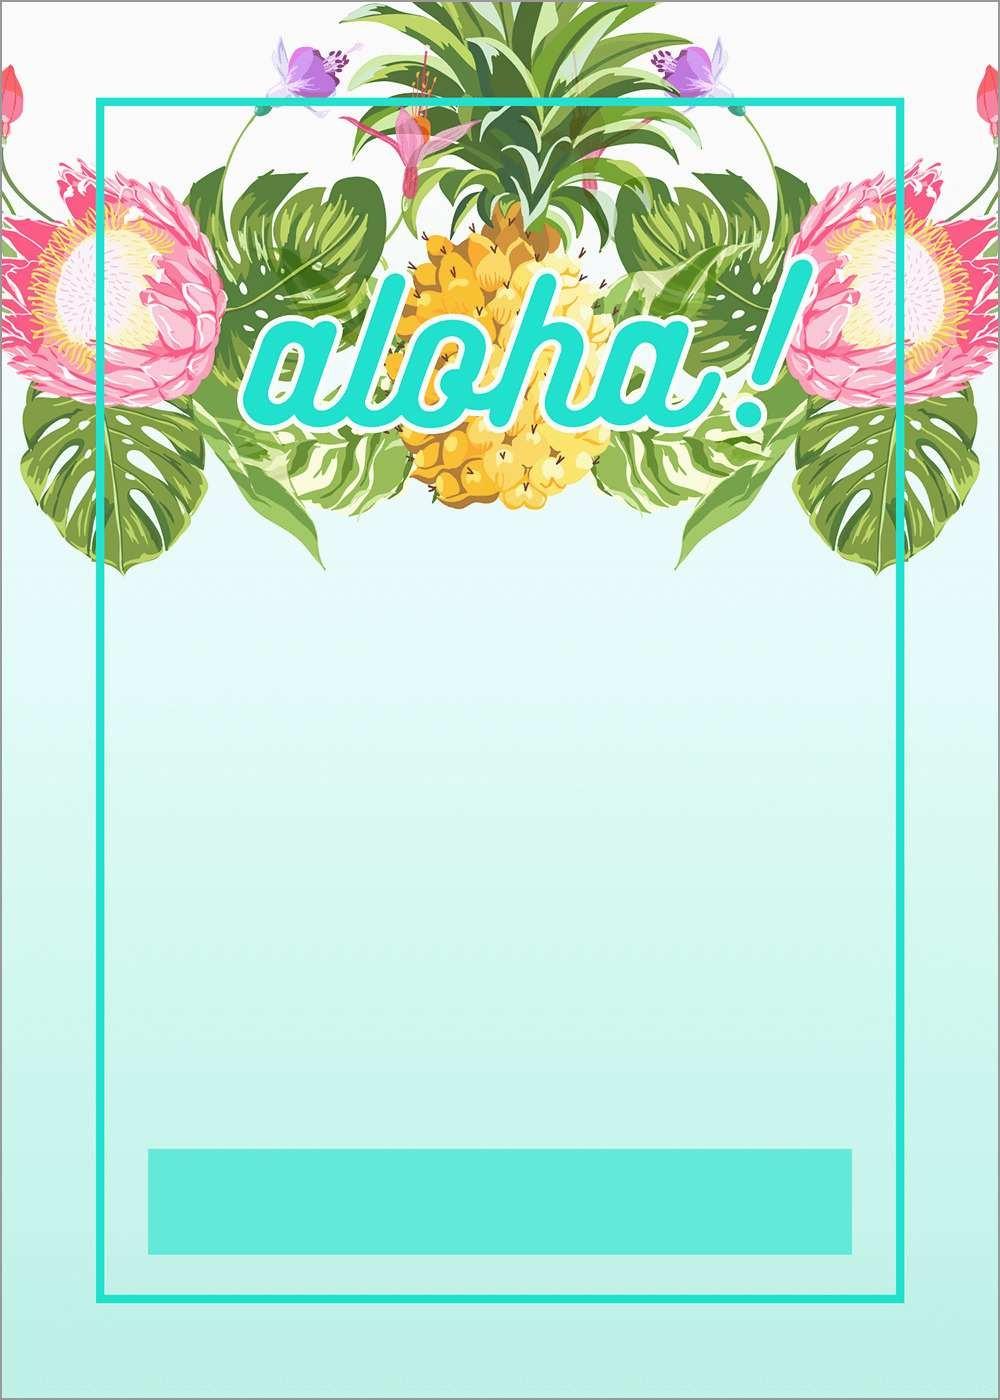 Free Hawaiian Luau Flyer Template Beautiful Luau Party Invitations - Hawaiian Party Invitations Free Printable